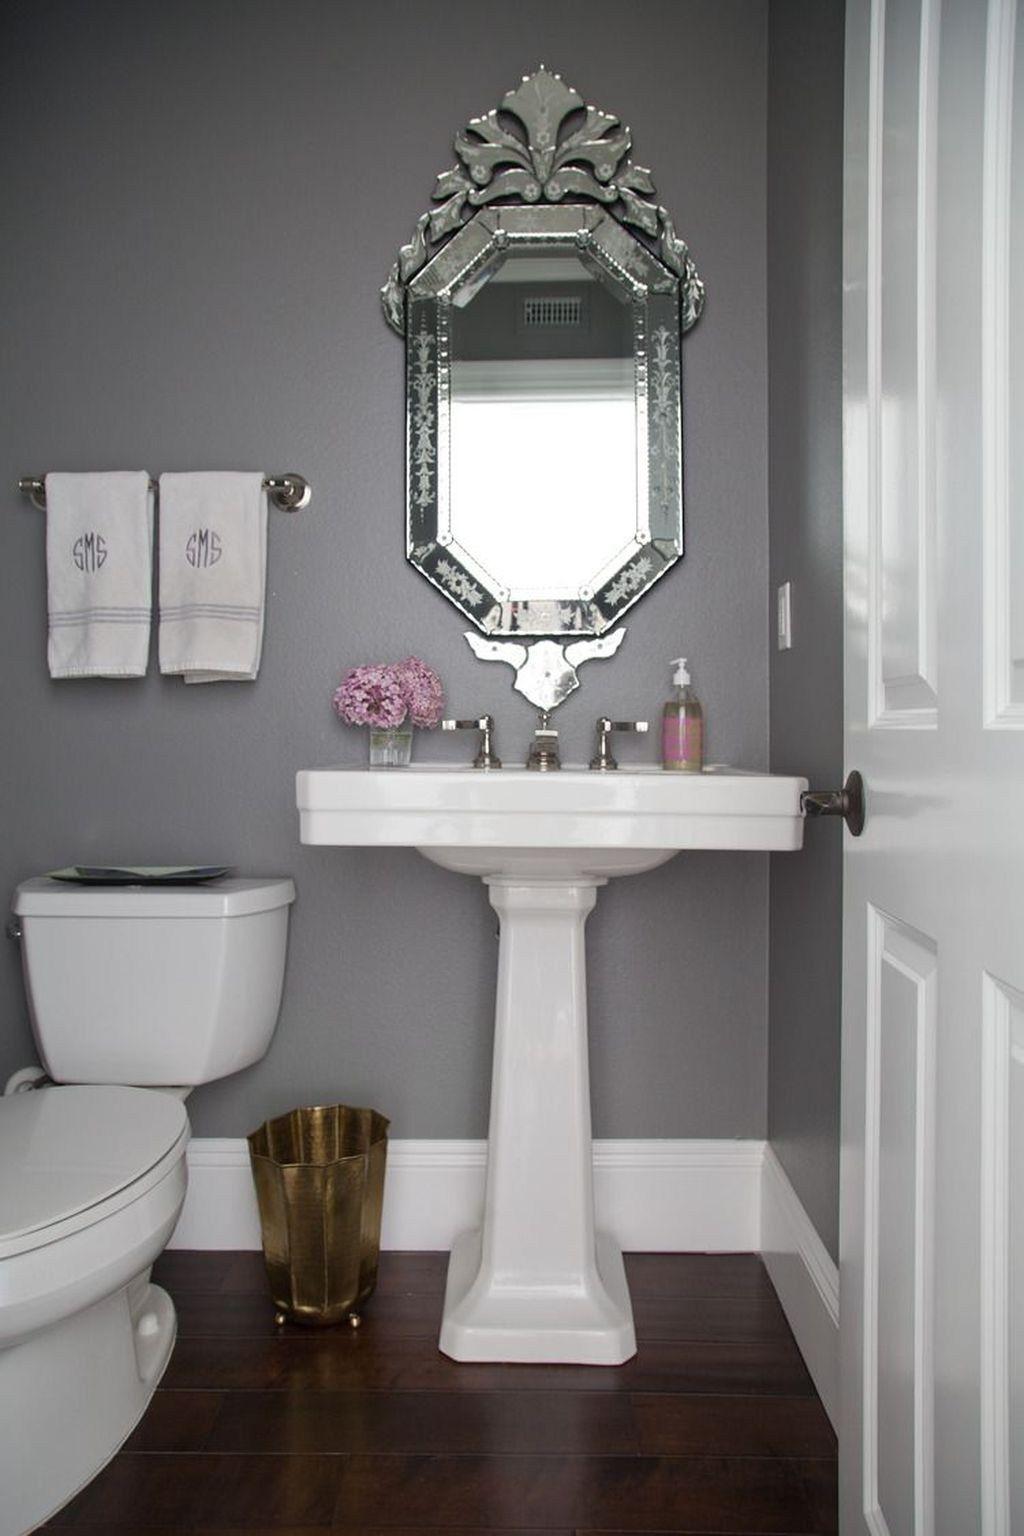 20 Awesome Small Powder Room Ideas Powder Room Decor Grey